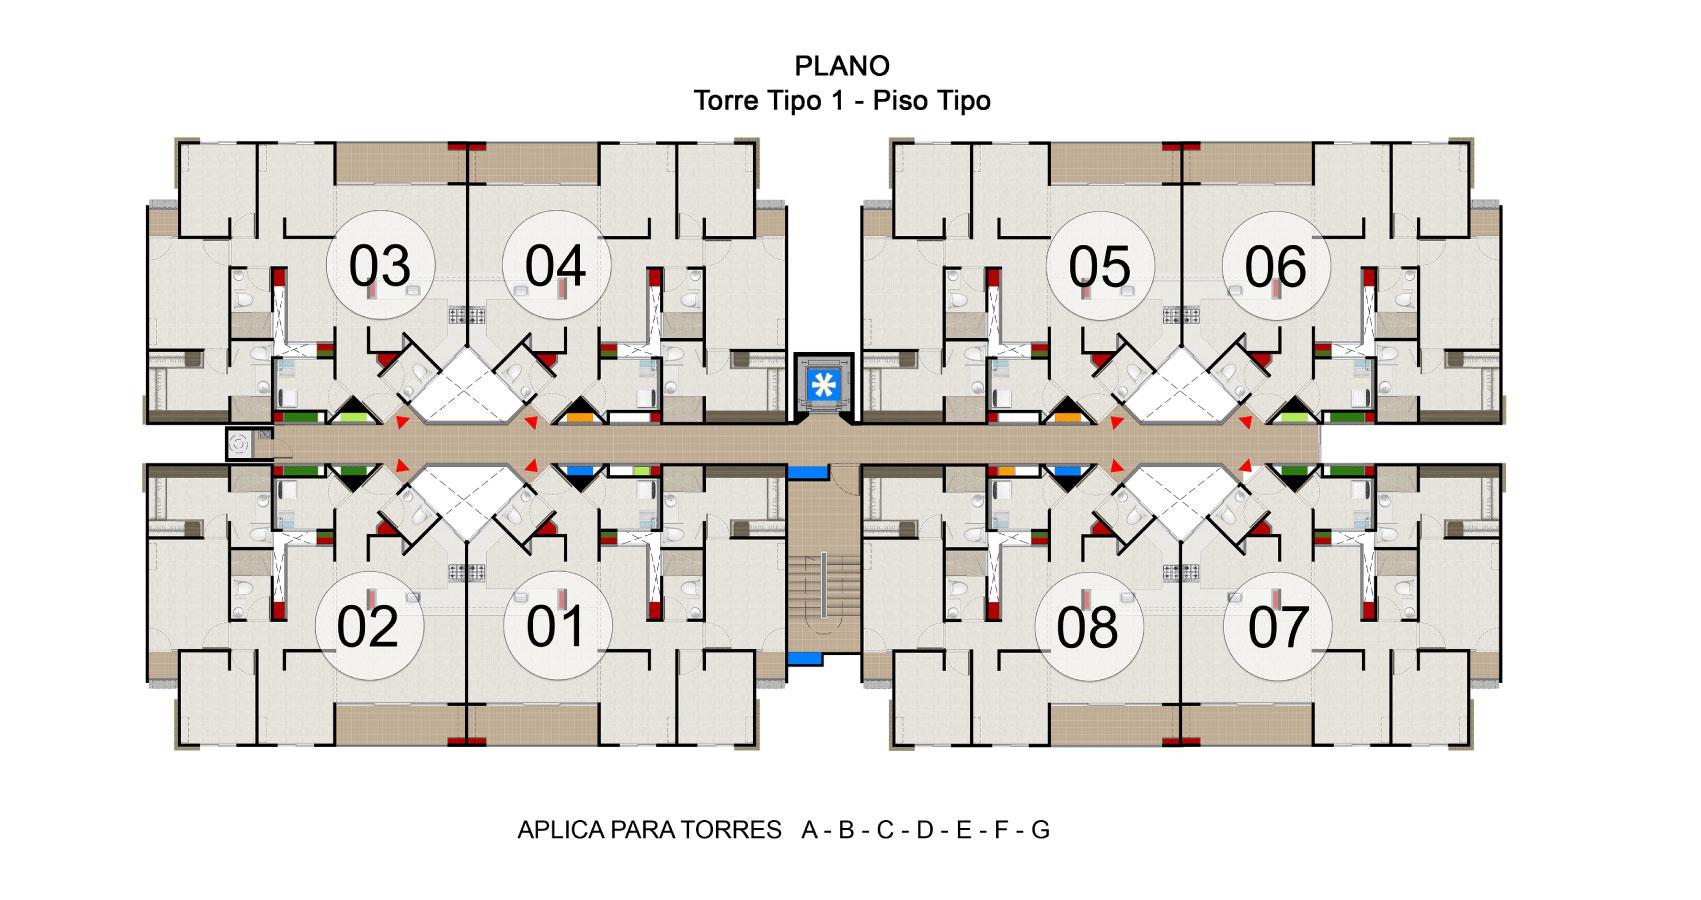 Plano Torre solé apartamentos jamundi Constructora Bolívar Valle del Cauca